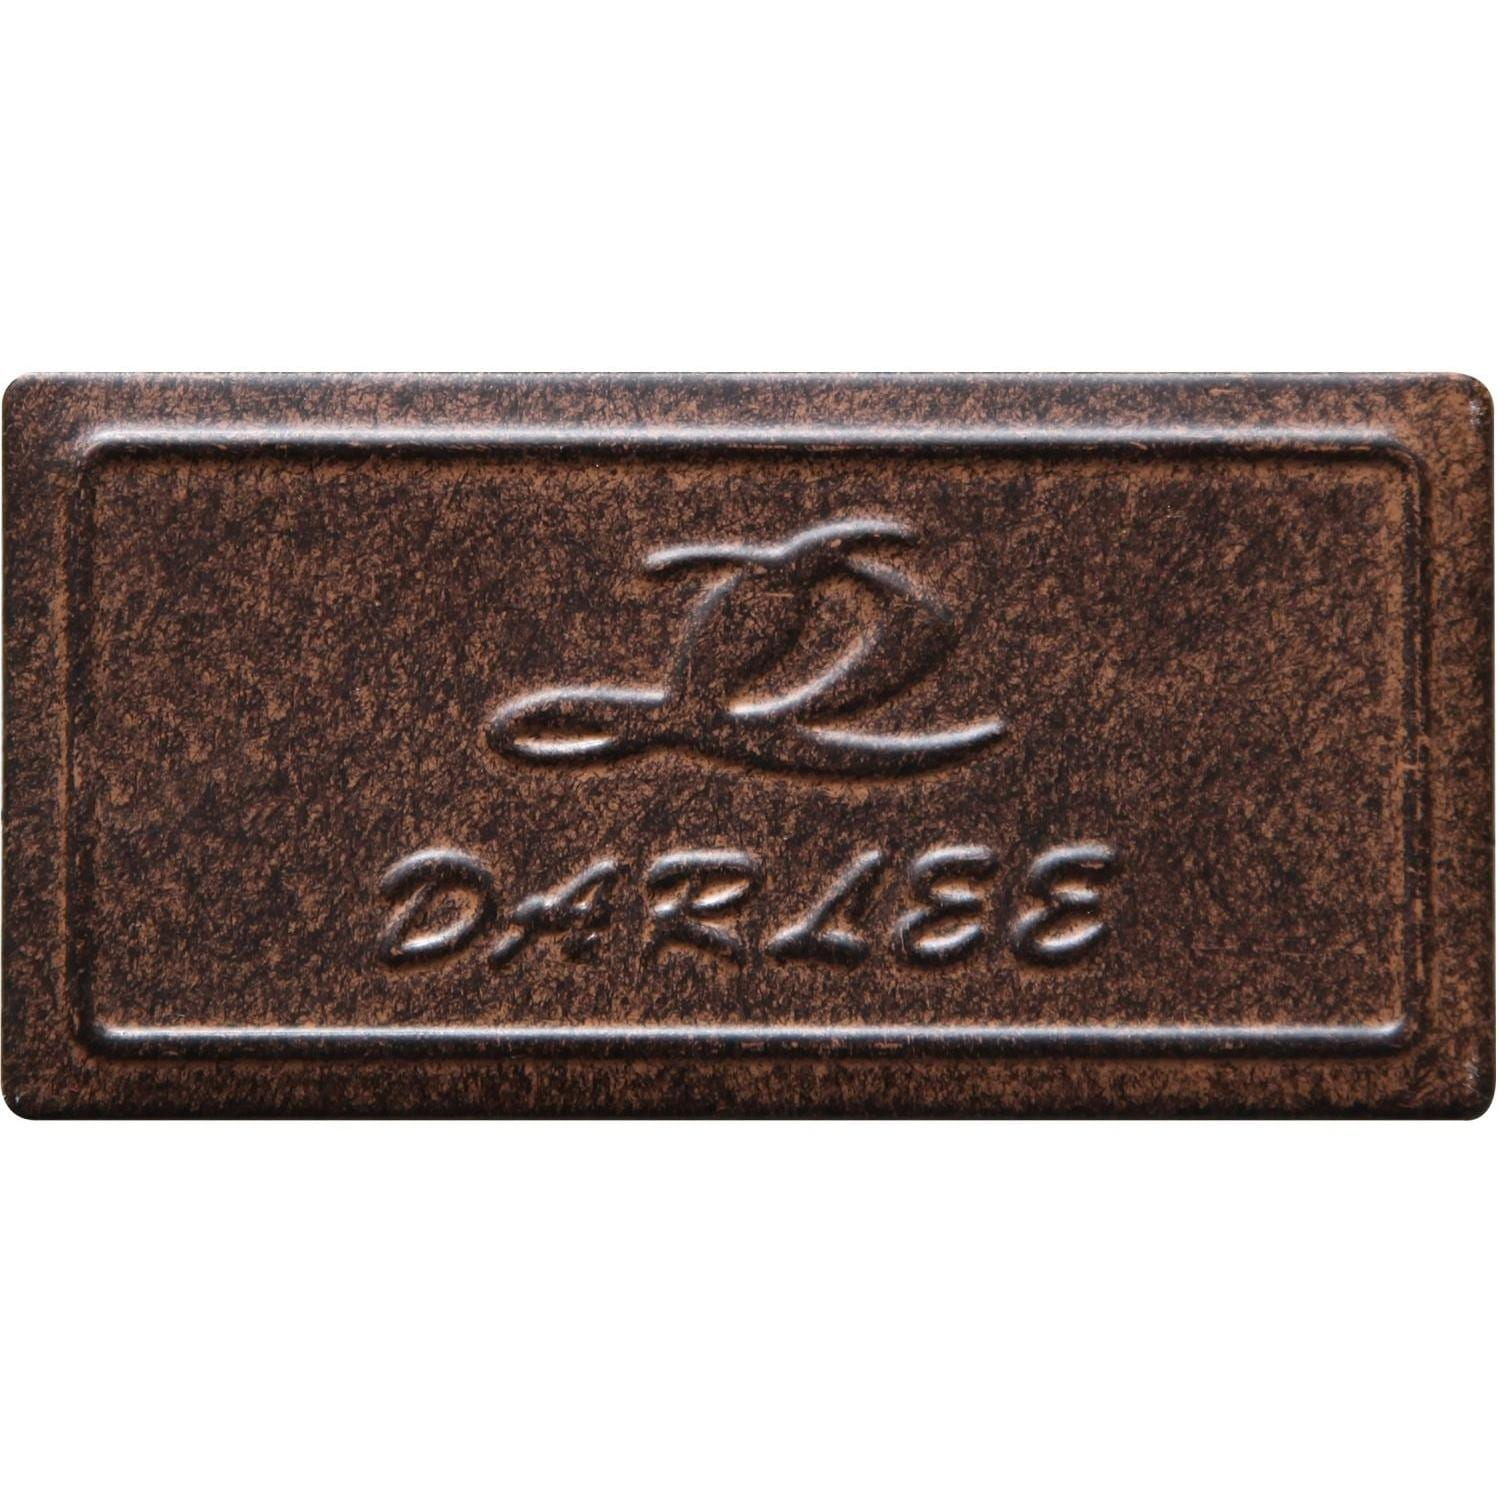 Darlee Sedona 5 Piece Patio Bar Set